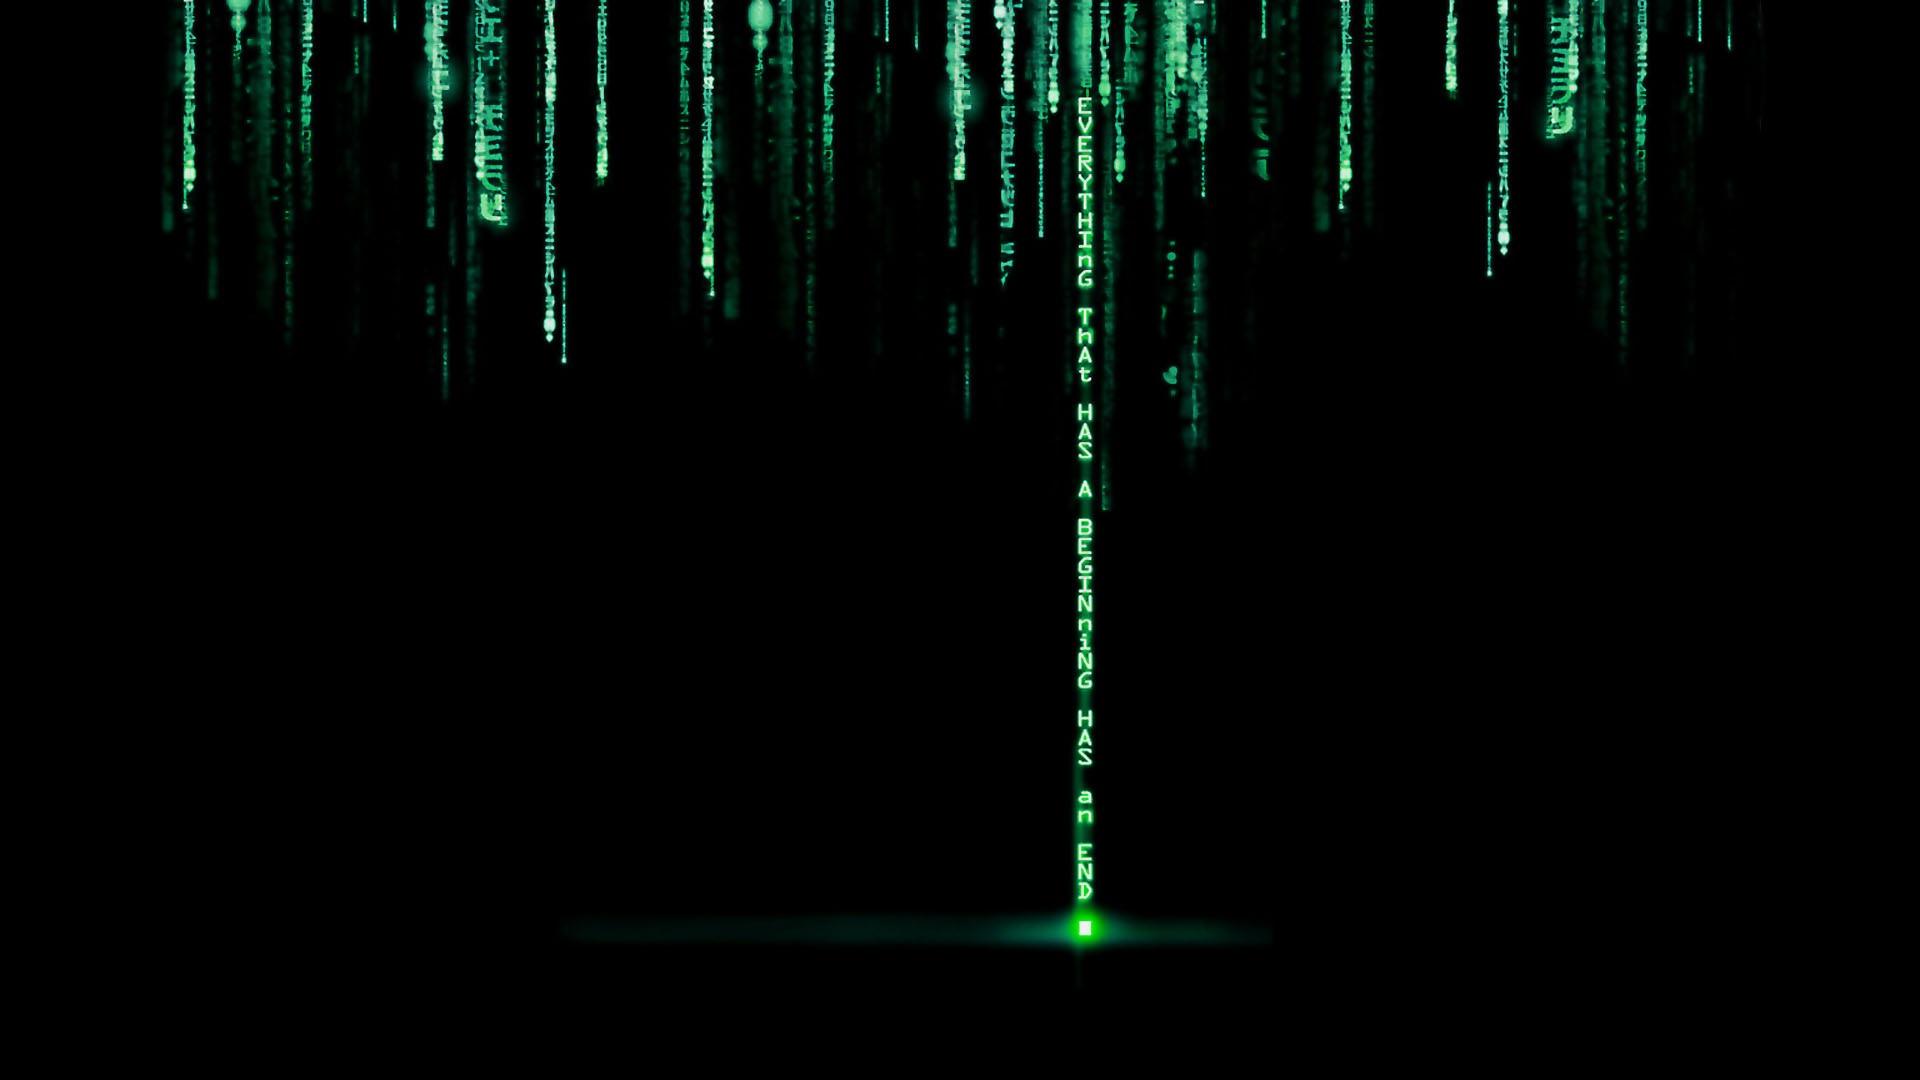 Programming Codes Wallpaper Code wallpaper 1920x1080